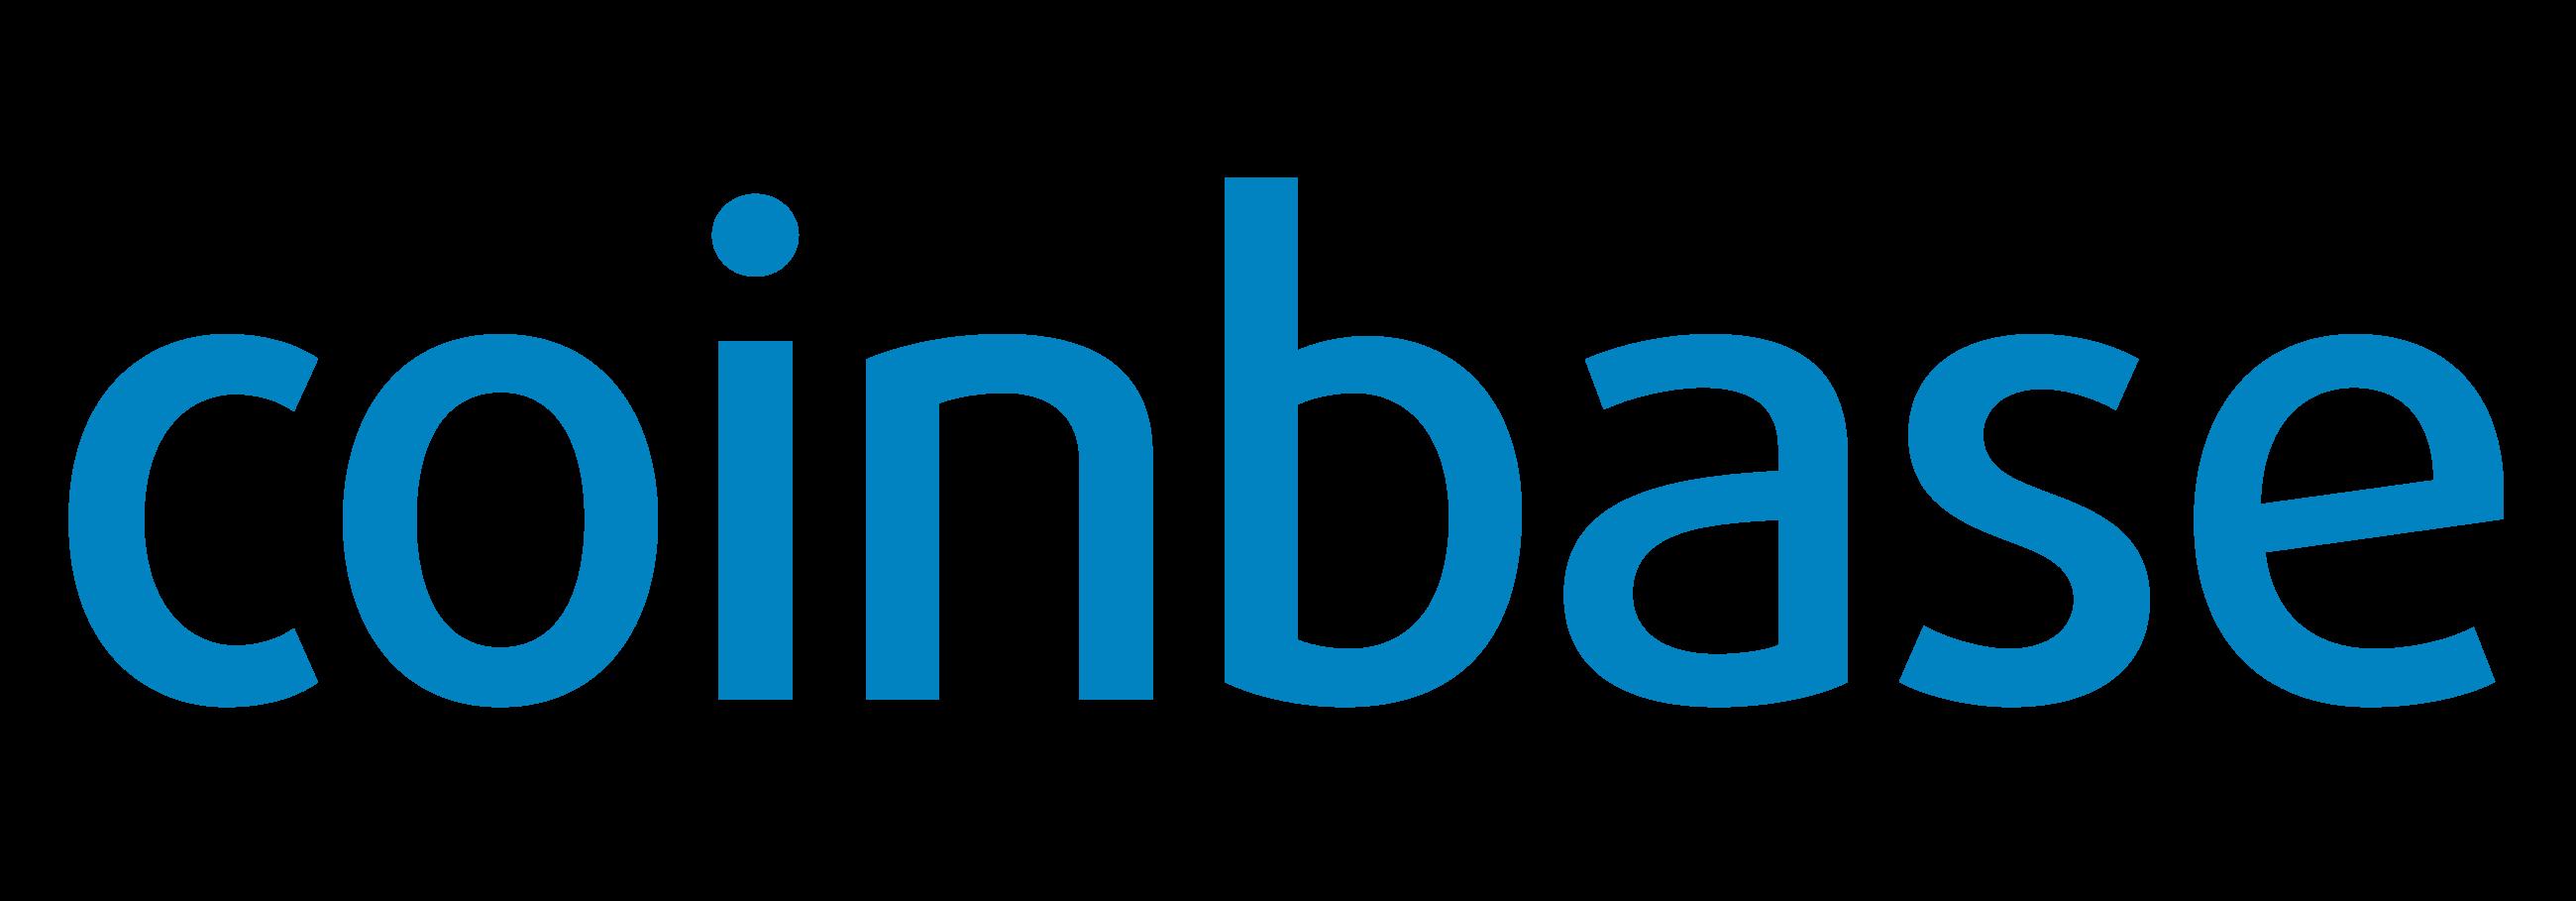 Логотип Coinbase